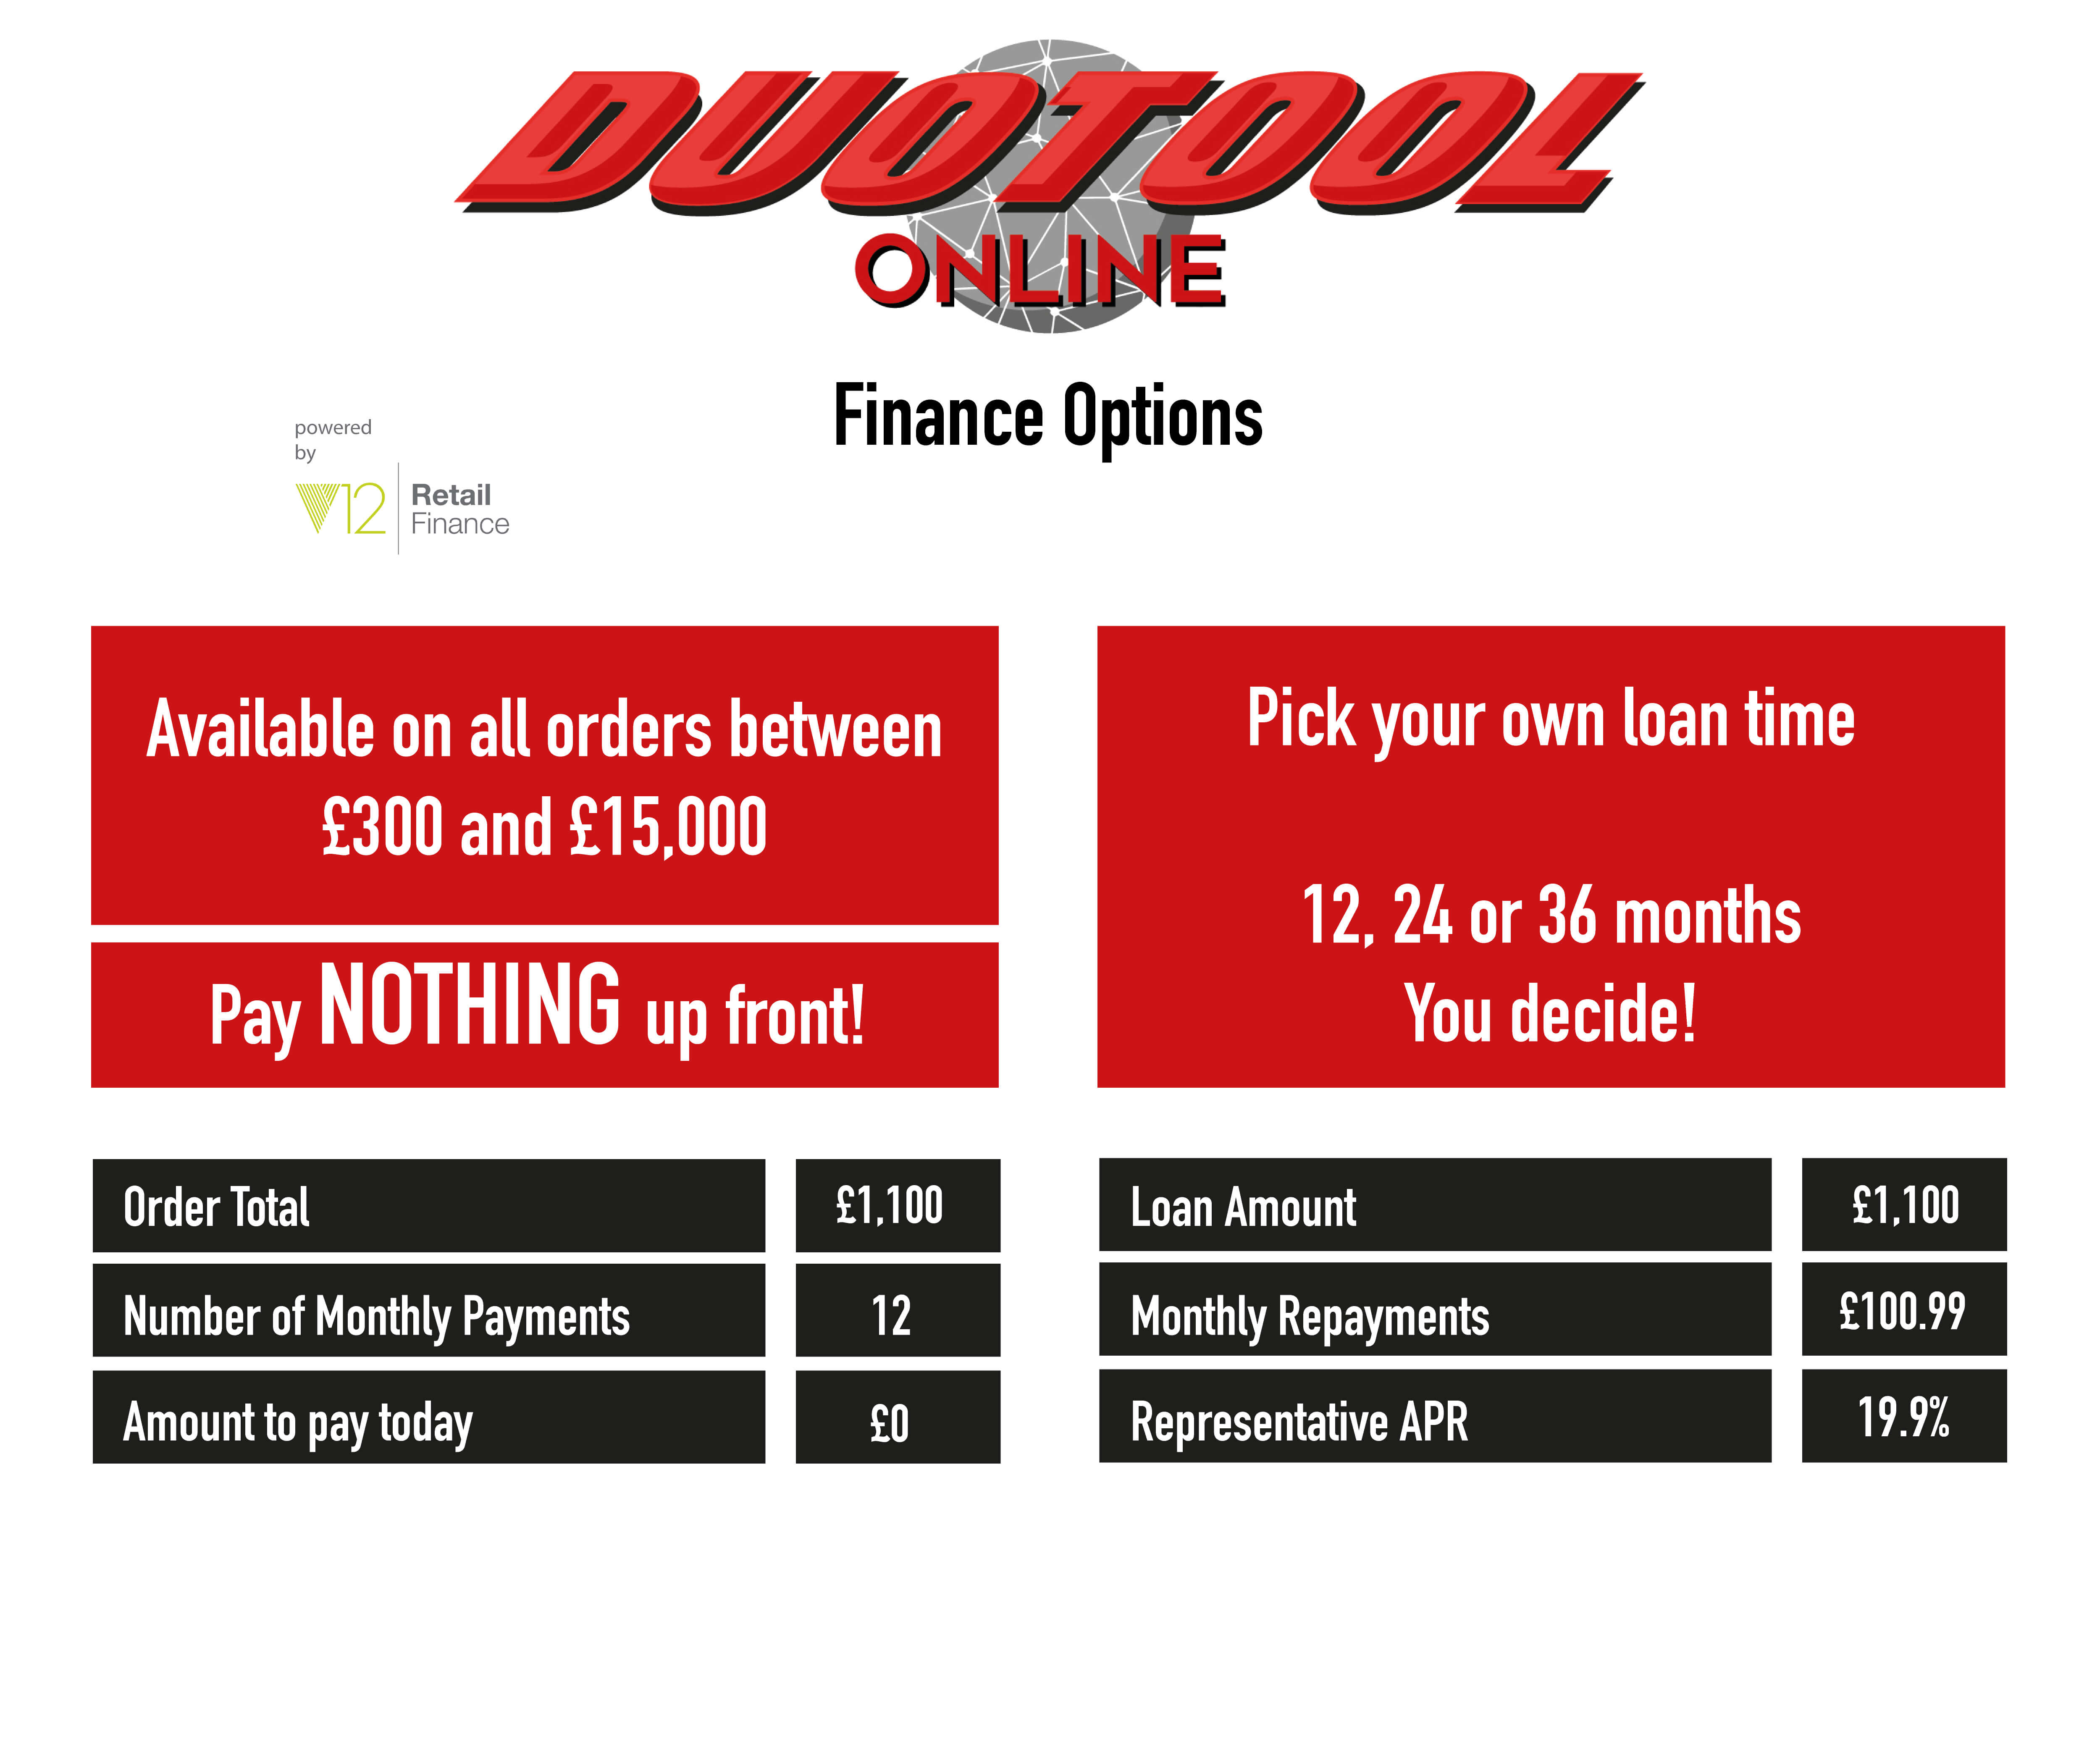 duotoolfinancedeposit.jpg